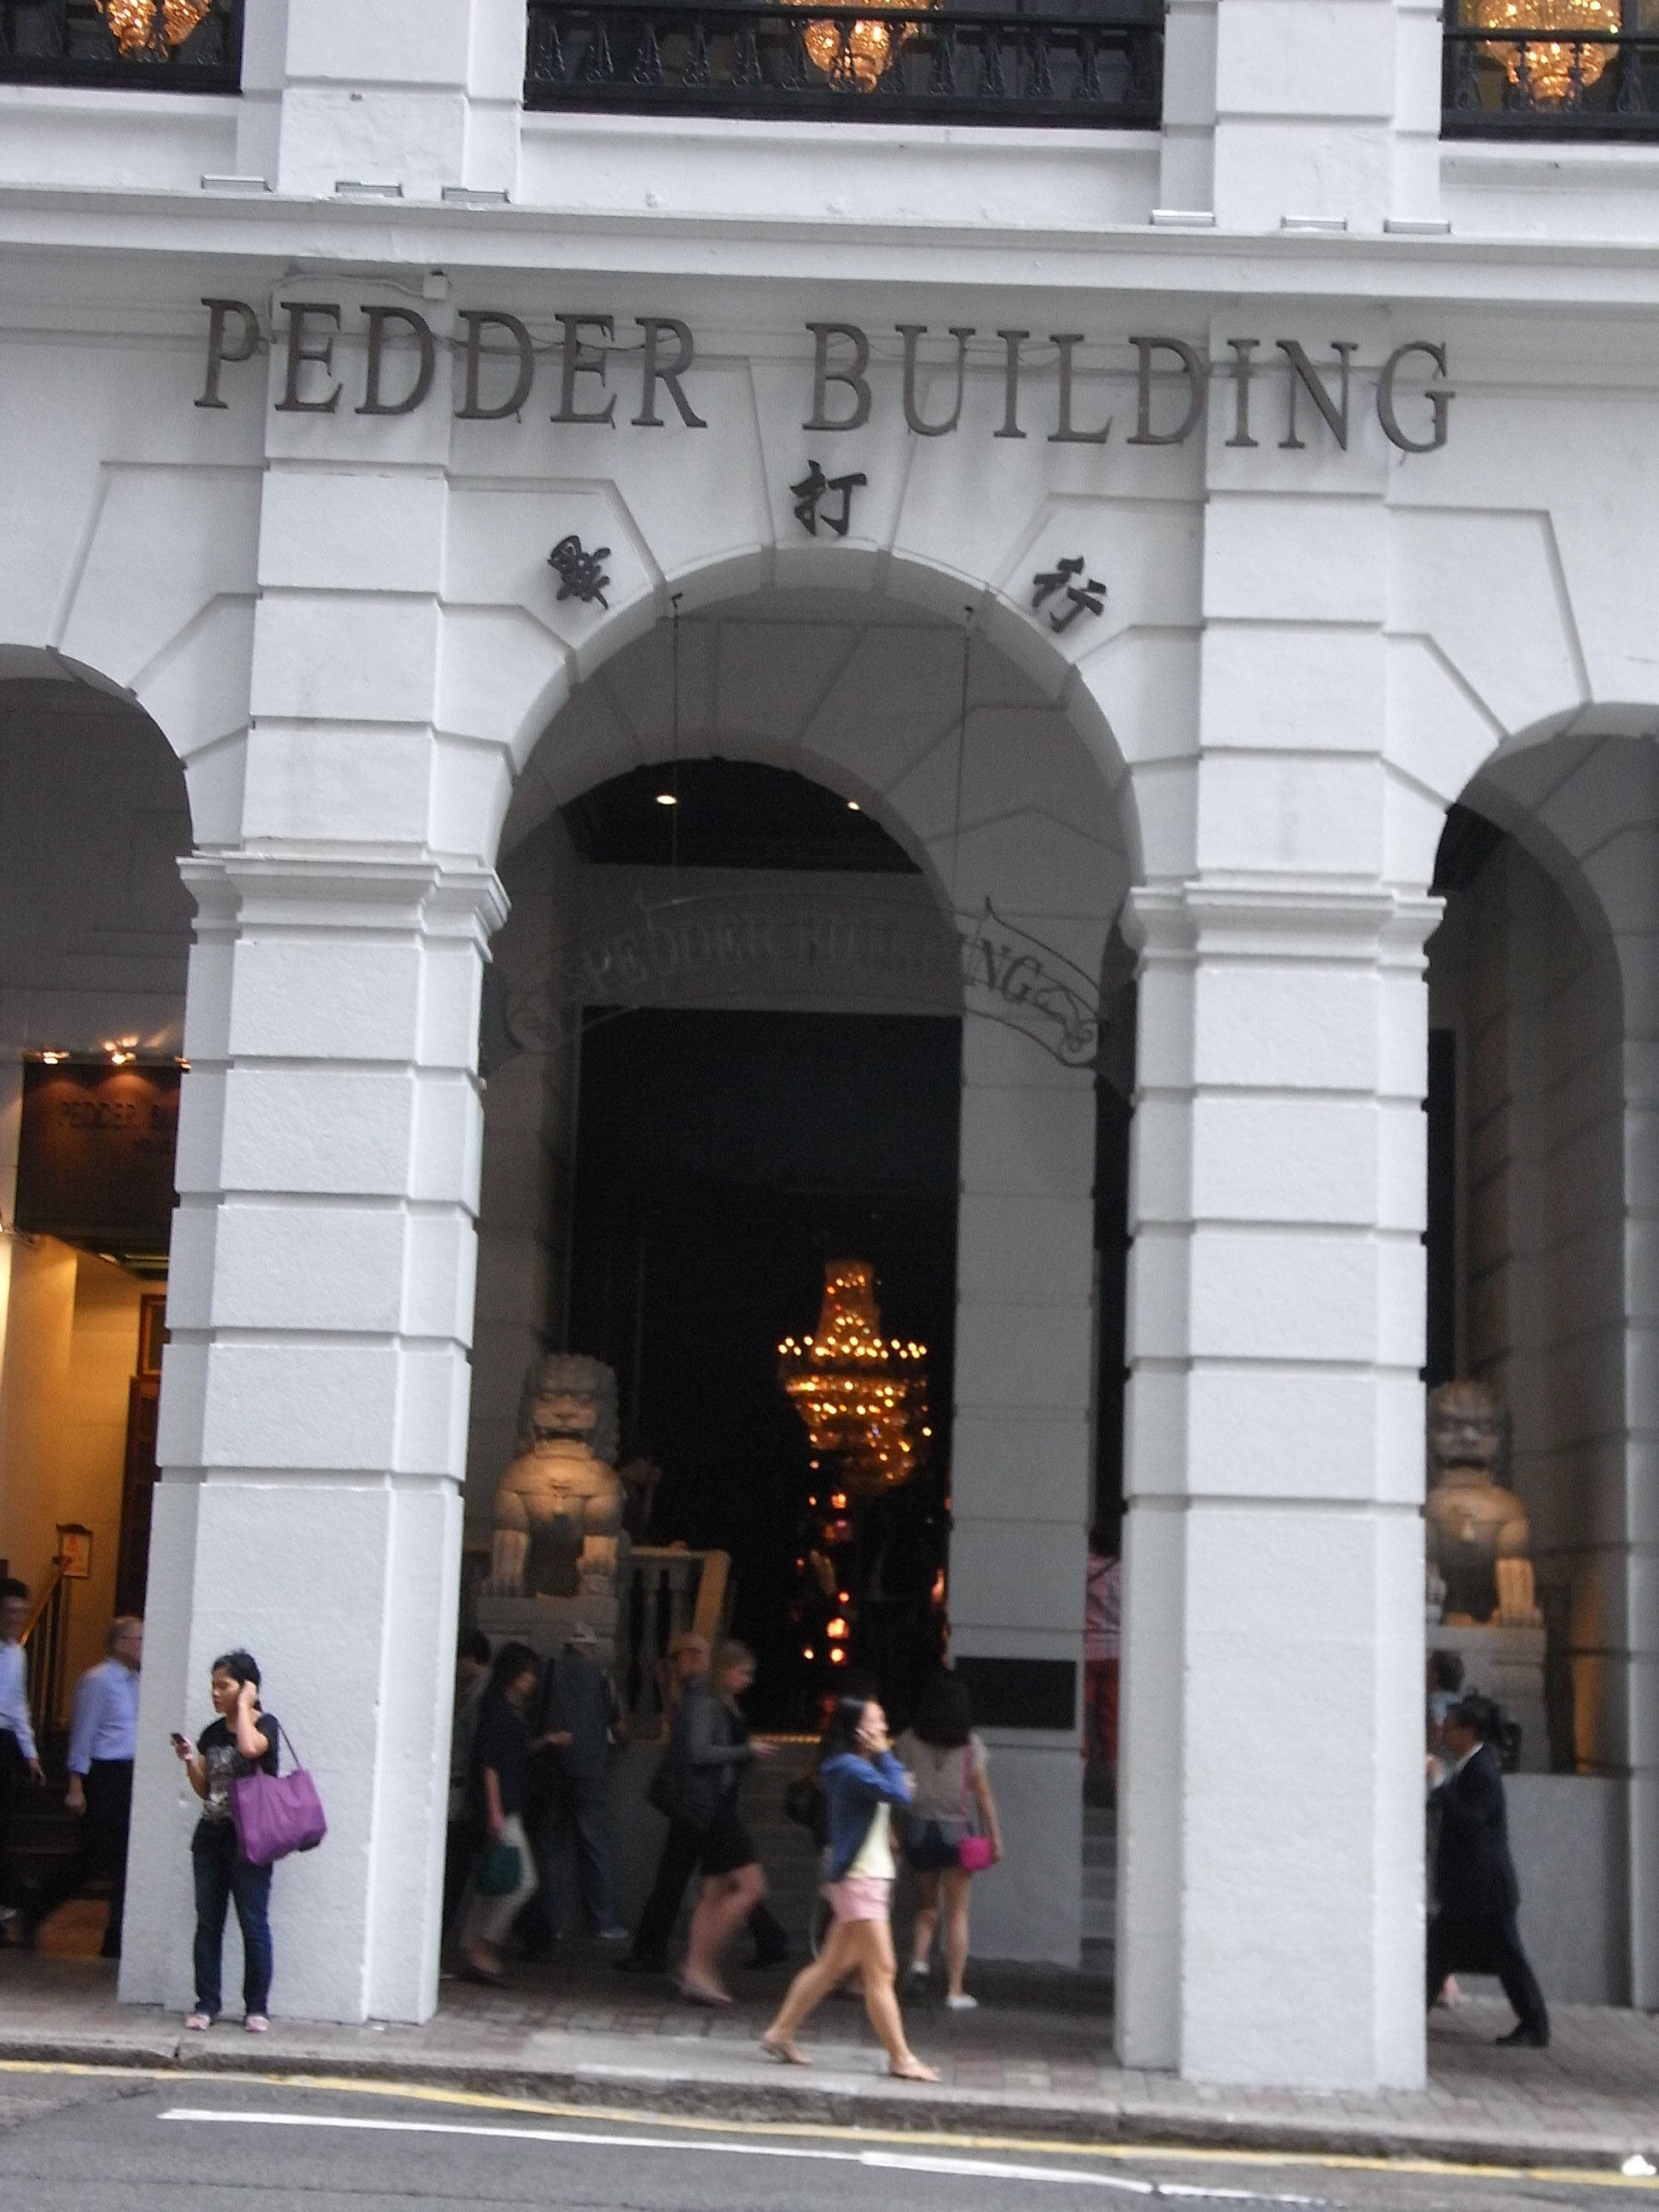 Street Pedder Building